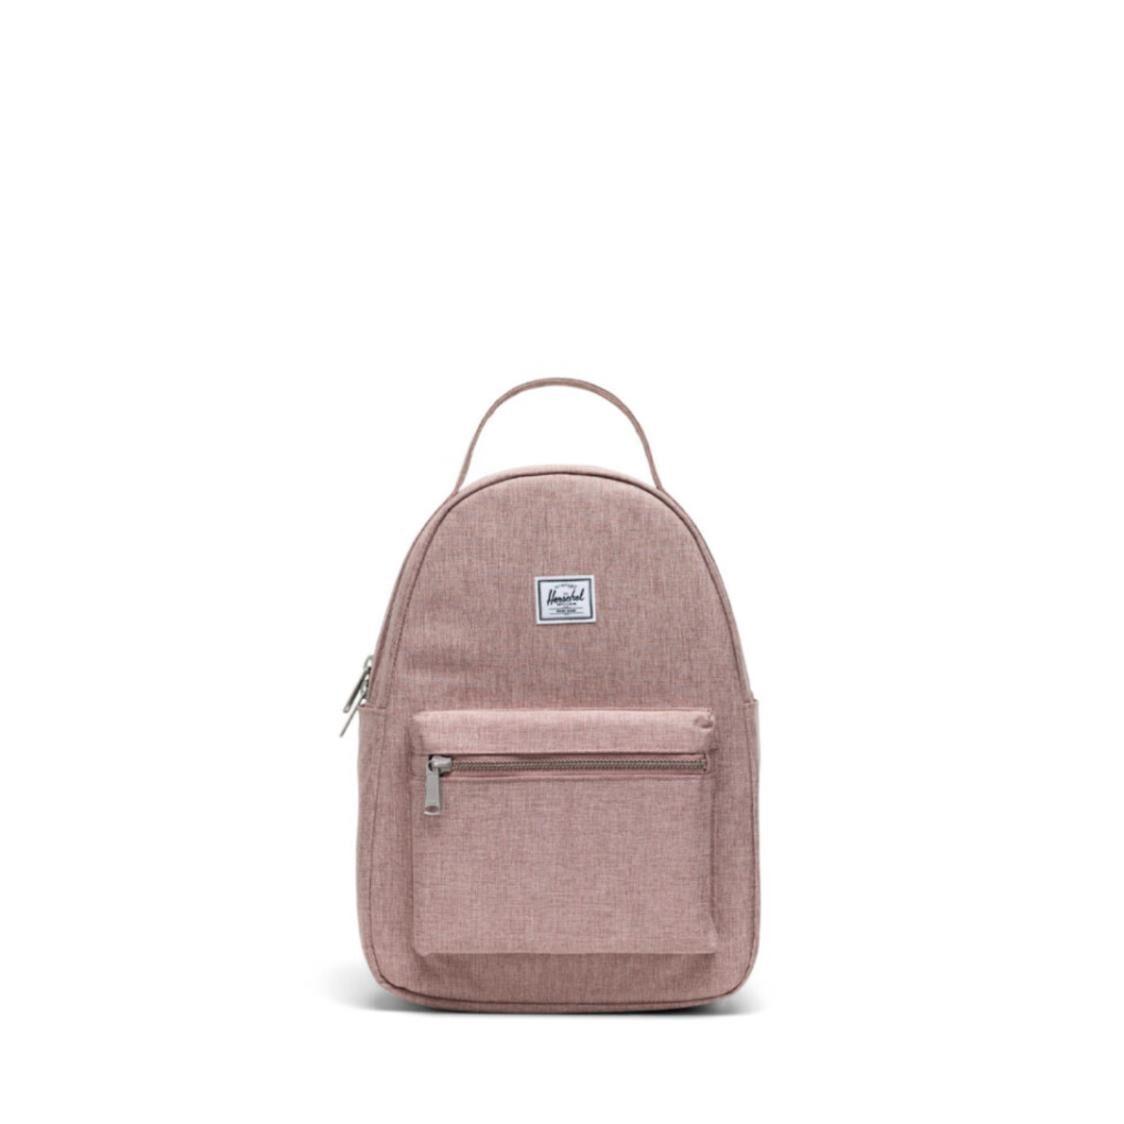 Herschel Nova Small Ash Rose Crosshatch Backpack 10502-04885-OS